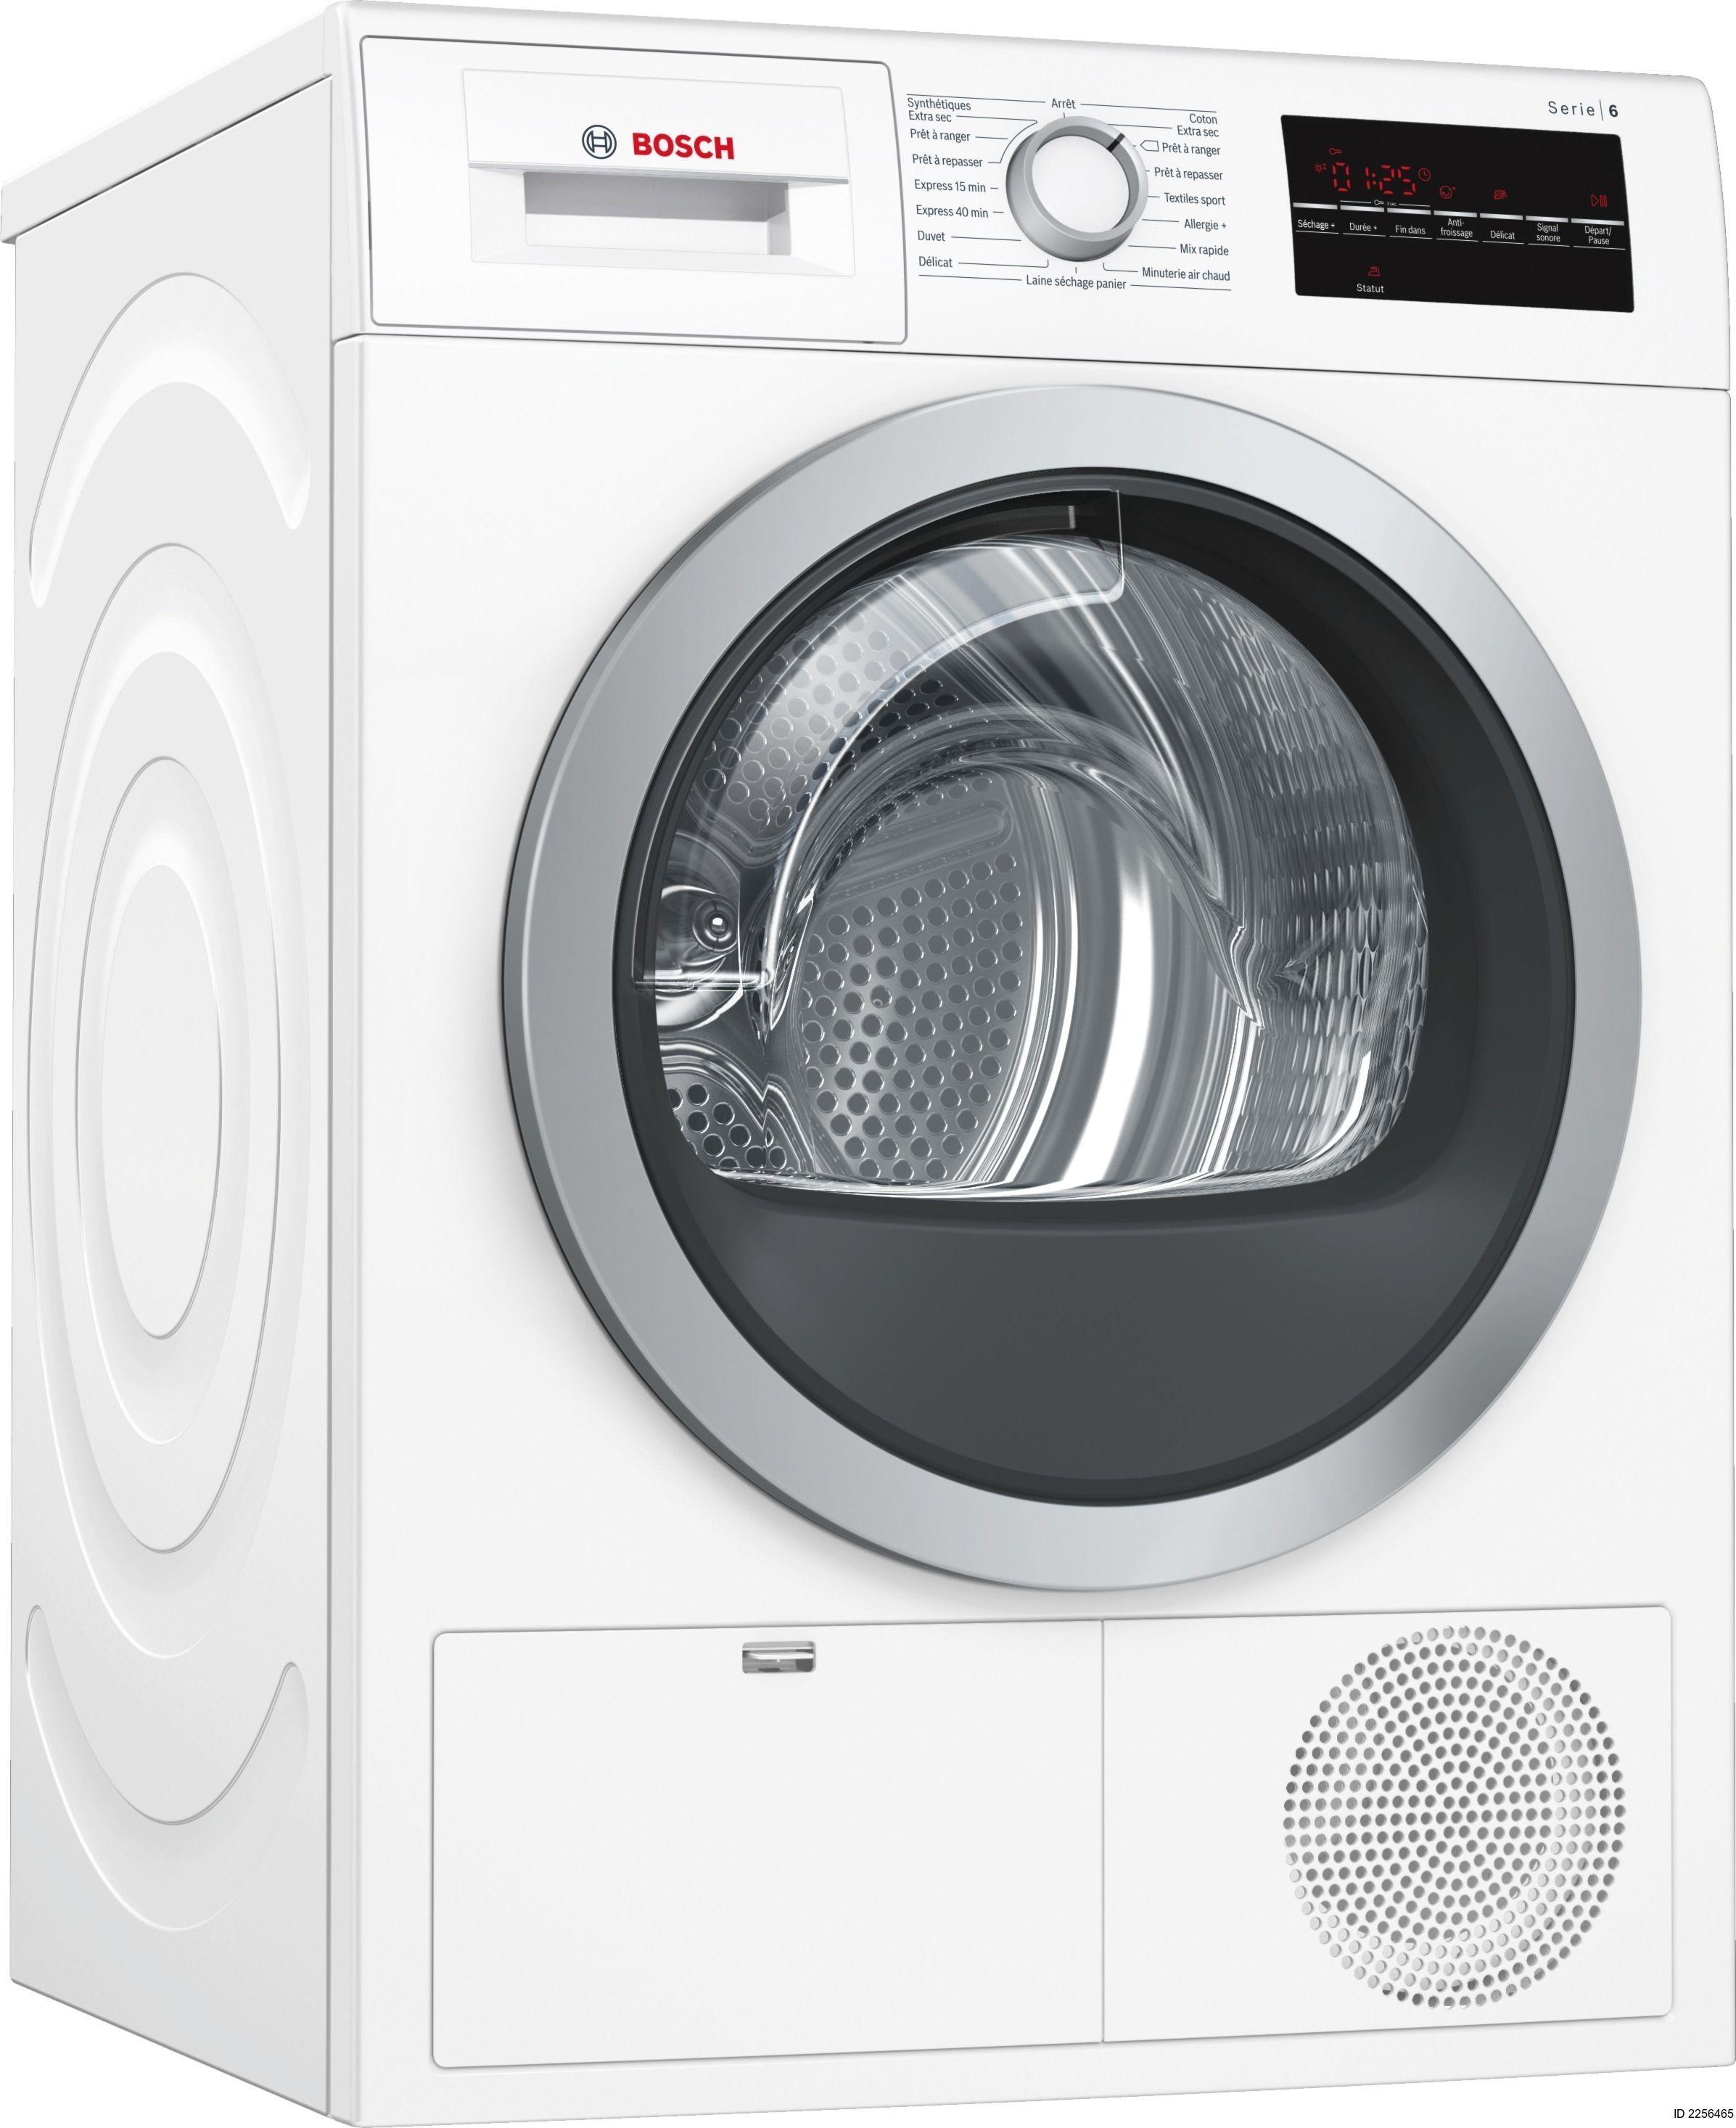 bosch s che linge condensation wtg86409ff blanc achat s che linge condensation b. Black Bedroom Furniture Sets. Home Design Ideas